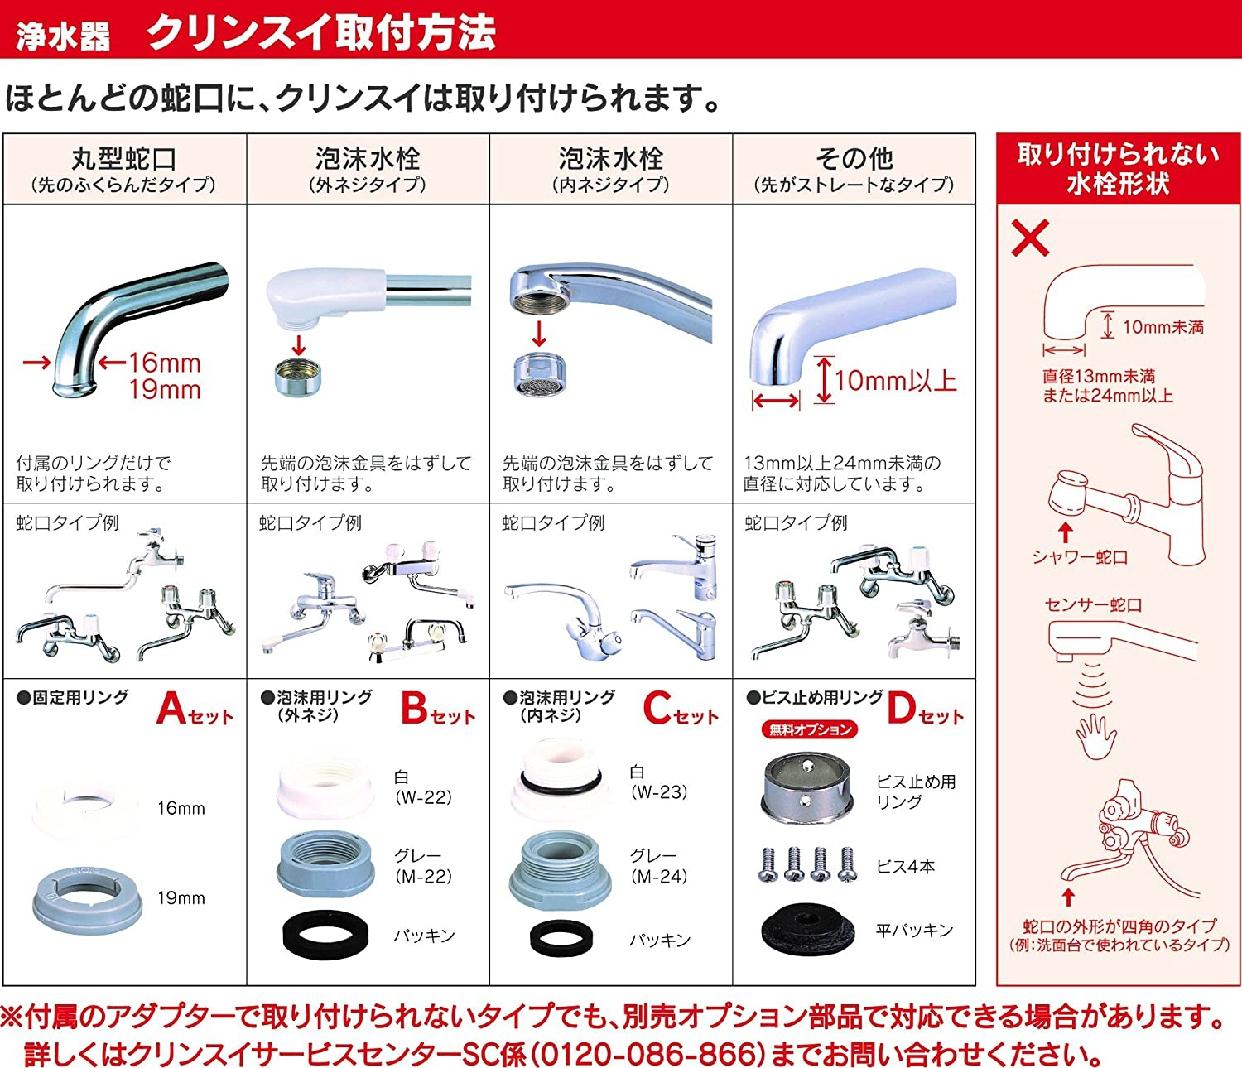 Cleansui(クリンスイ)蛇口直結型浄水器 MONOシリーズ MD101の商品画像10